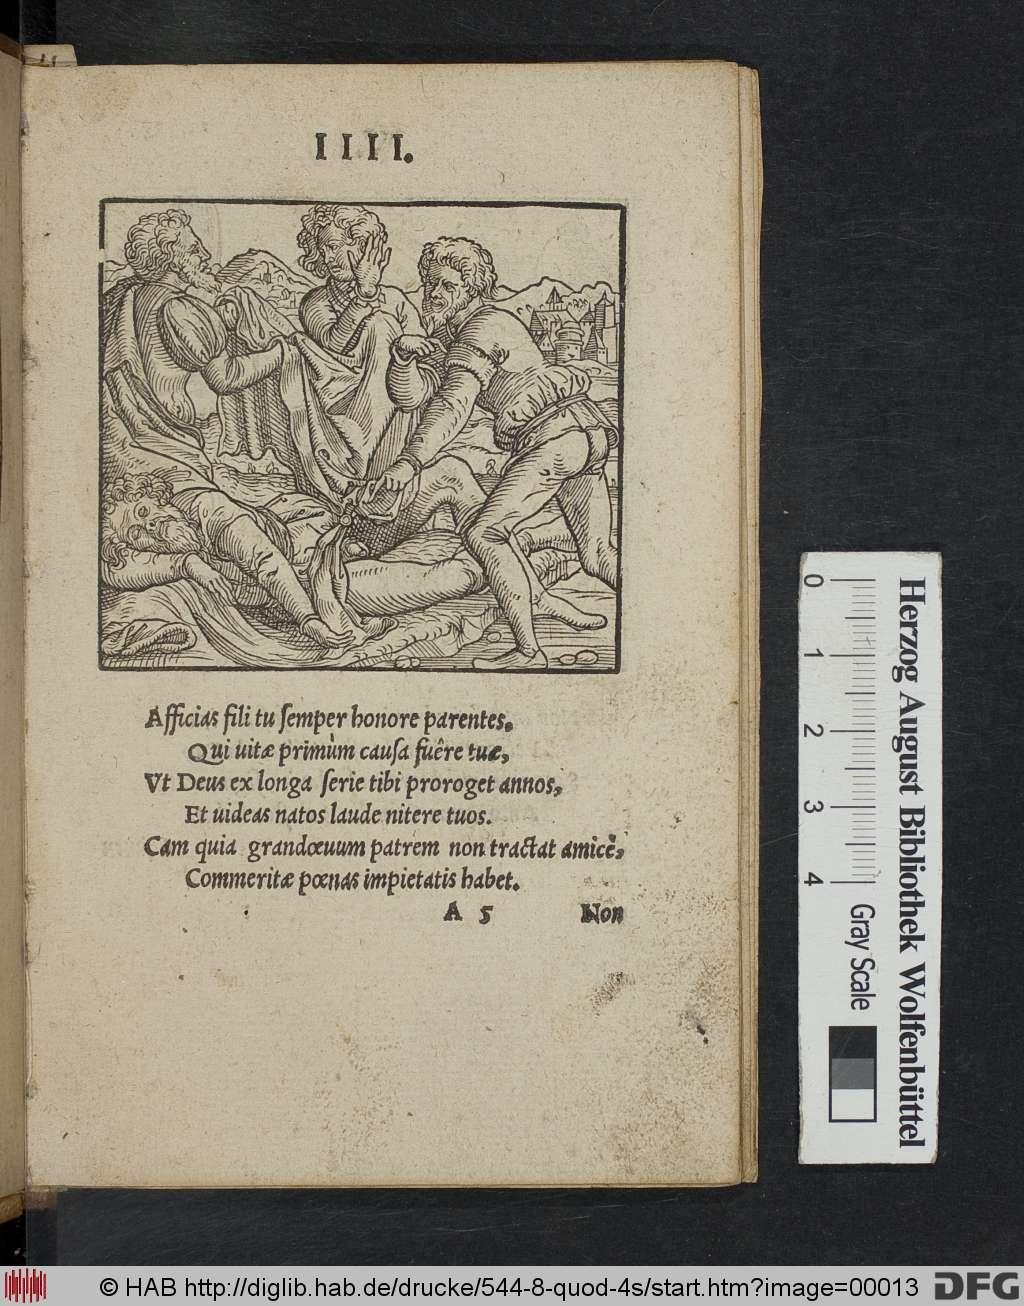 http://diglib.hab.de/drucke/544-8-quod-4s/00013.jpg